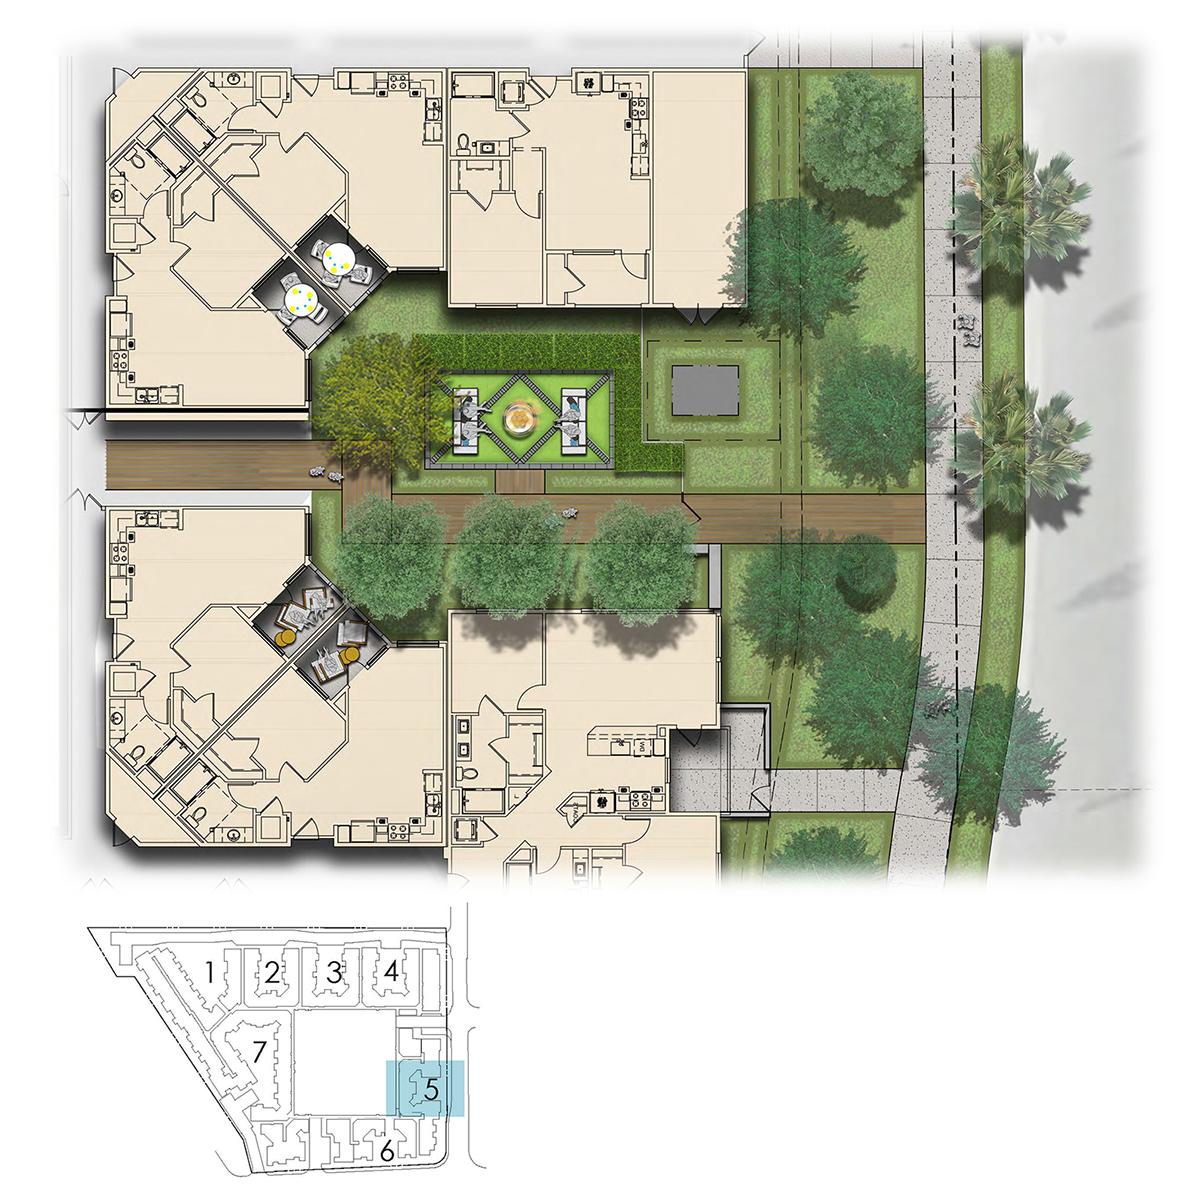 MJS_Courtyard5.jpg